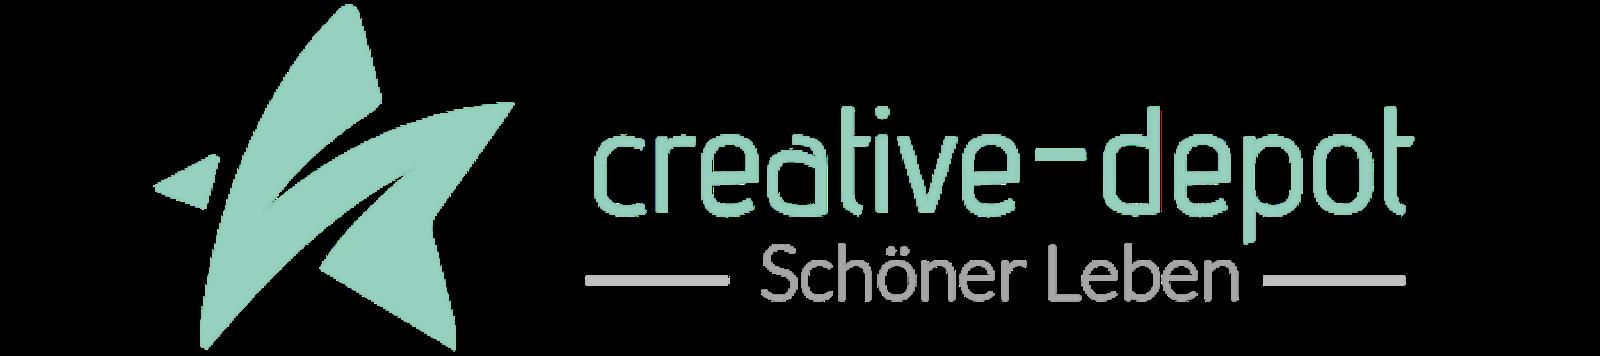 Shop creative-depot